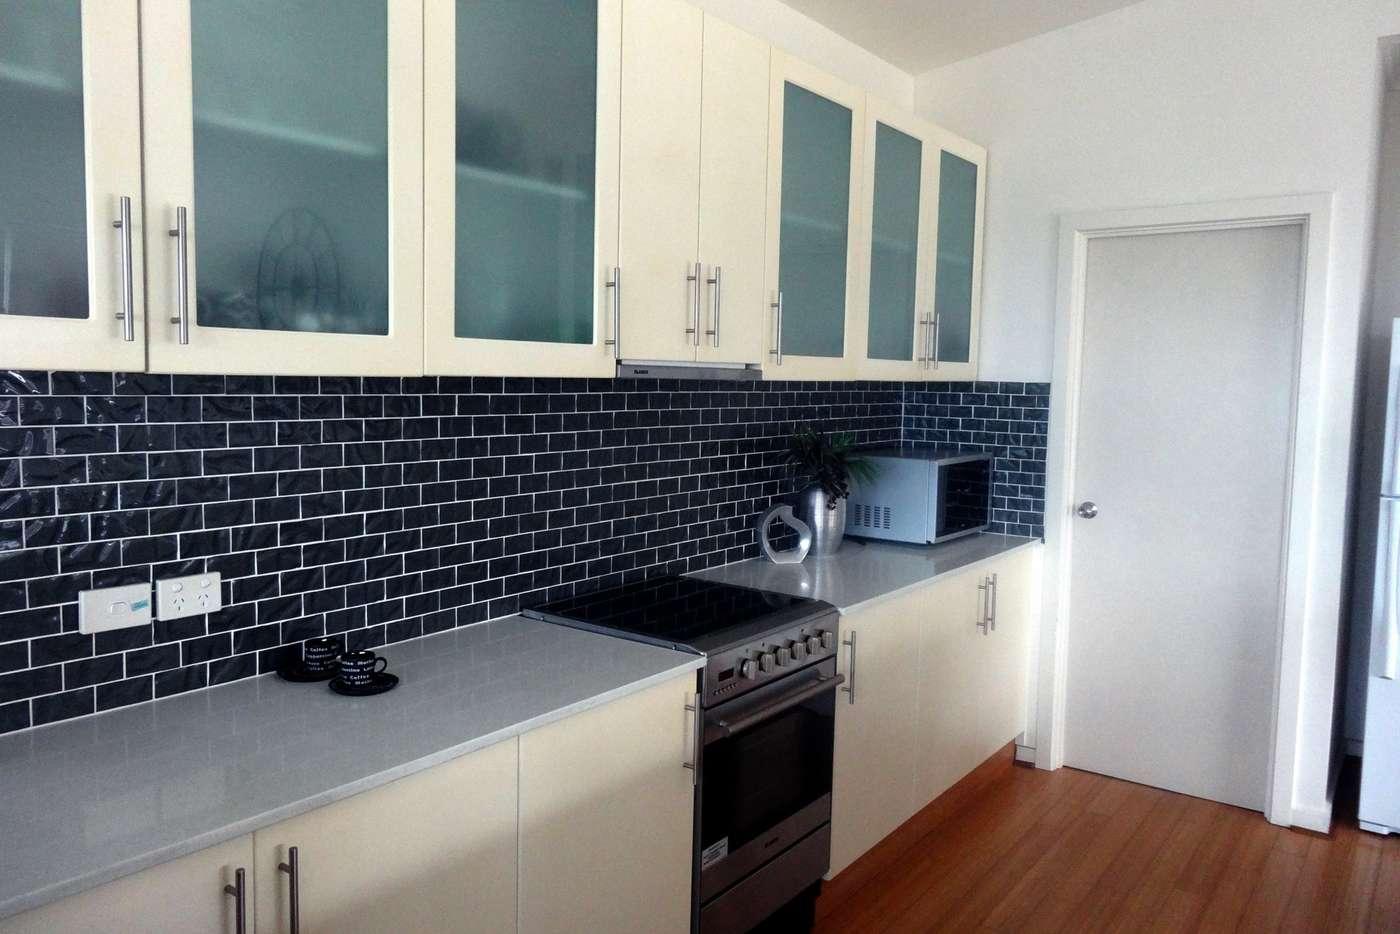 Seventh view of Homely house listing, 47 Battye Rd, Encounter Bay SA 5211